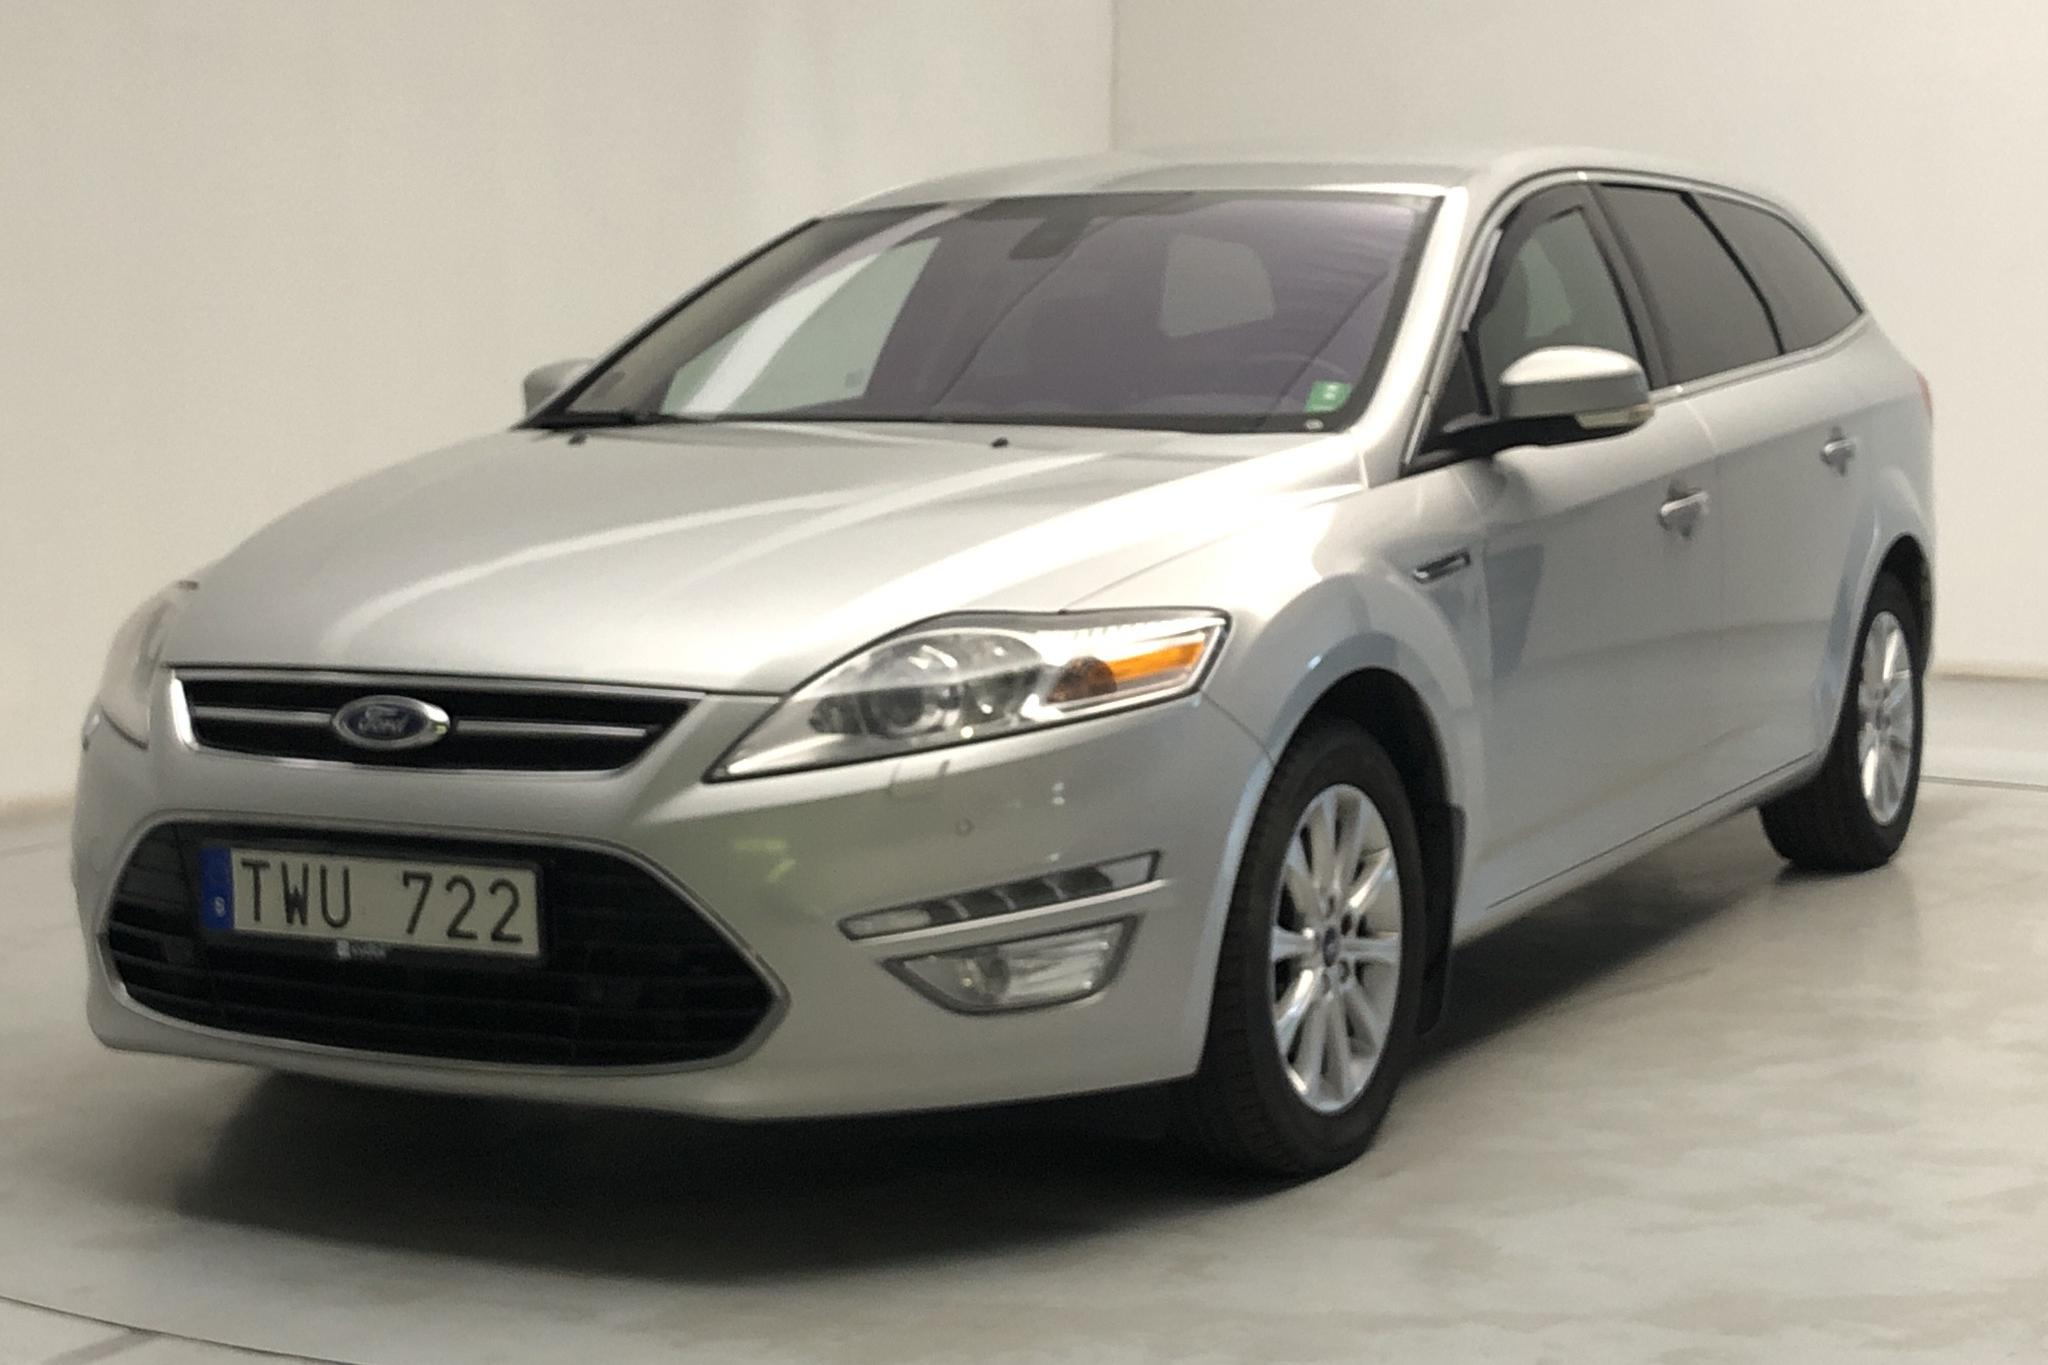 Ford Mondeo 2.0 Duratorq TDCi Kombi (163hk) - 236 910 km - Manual - gray - 2011